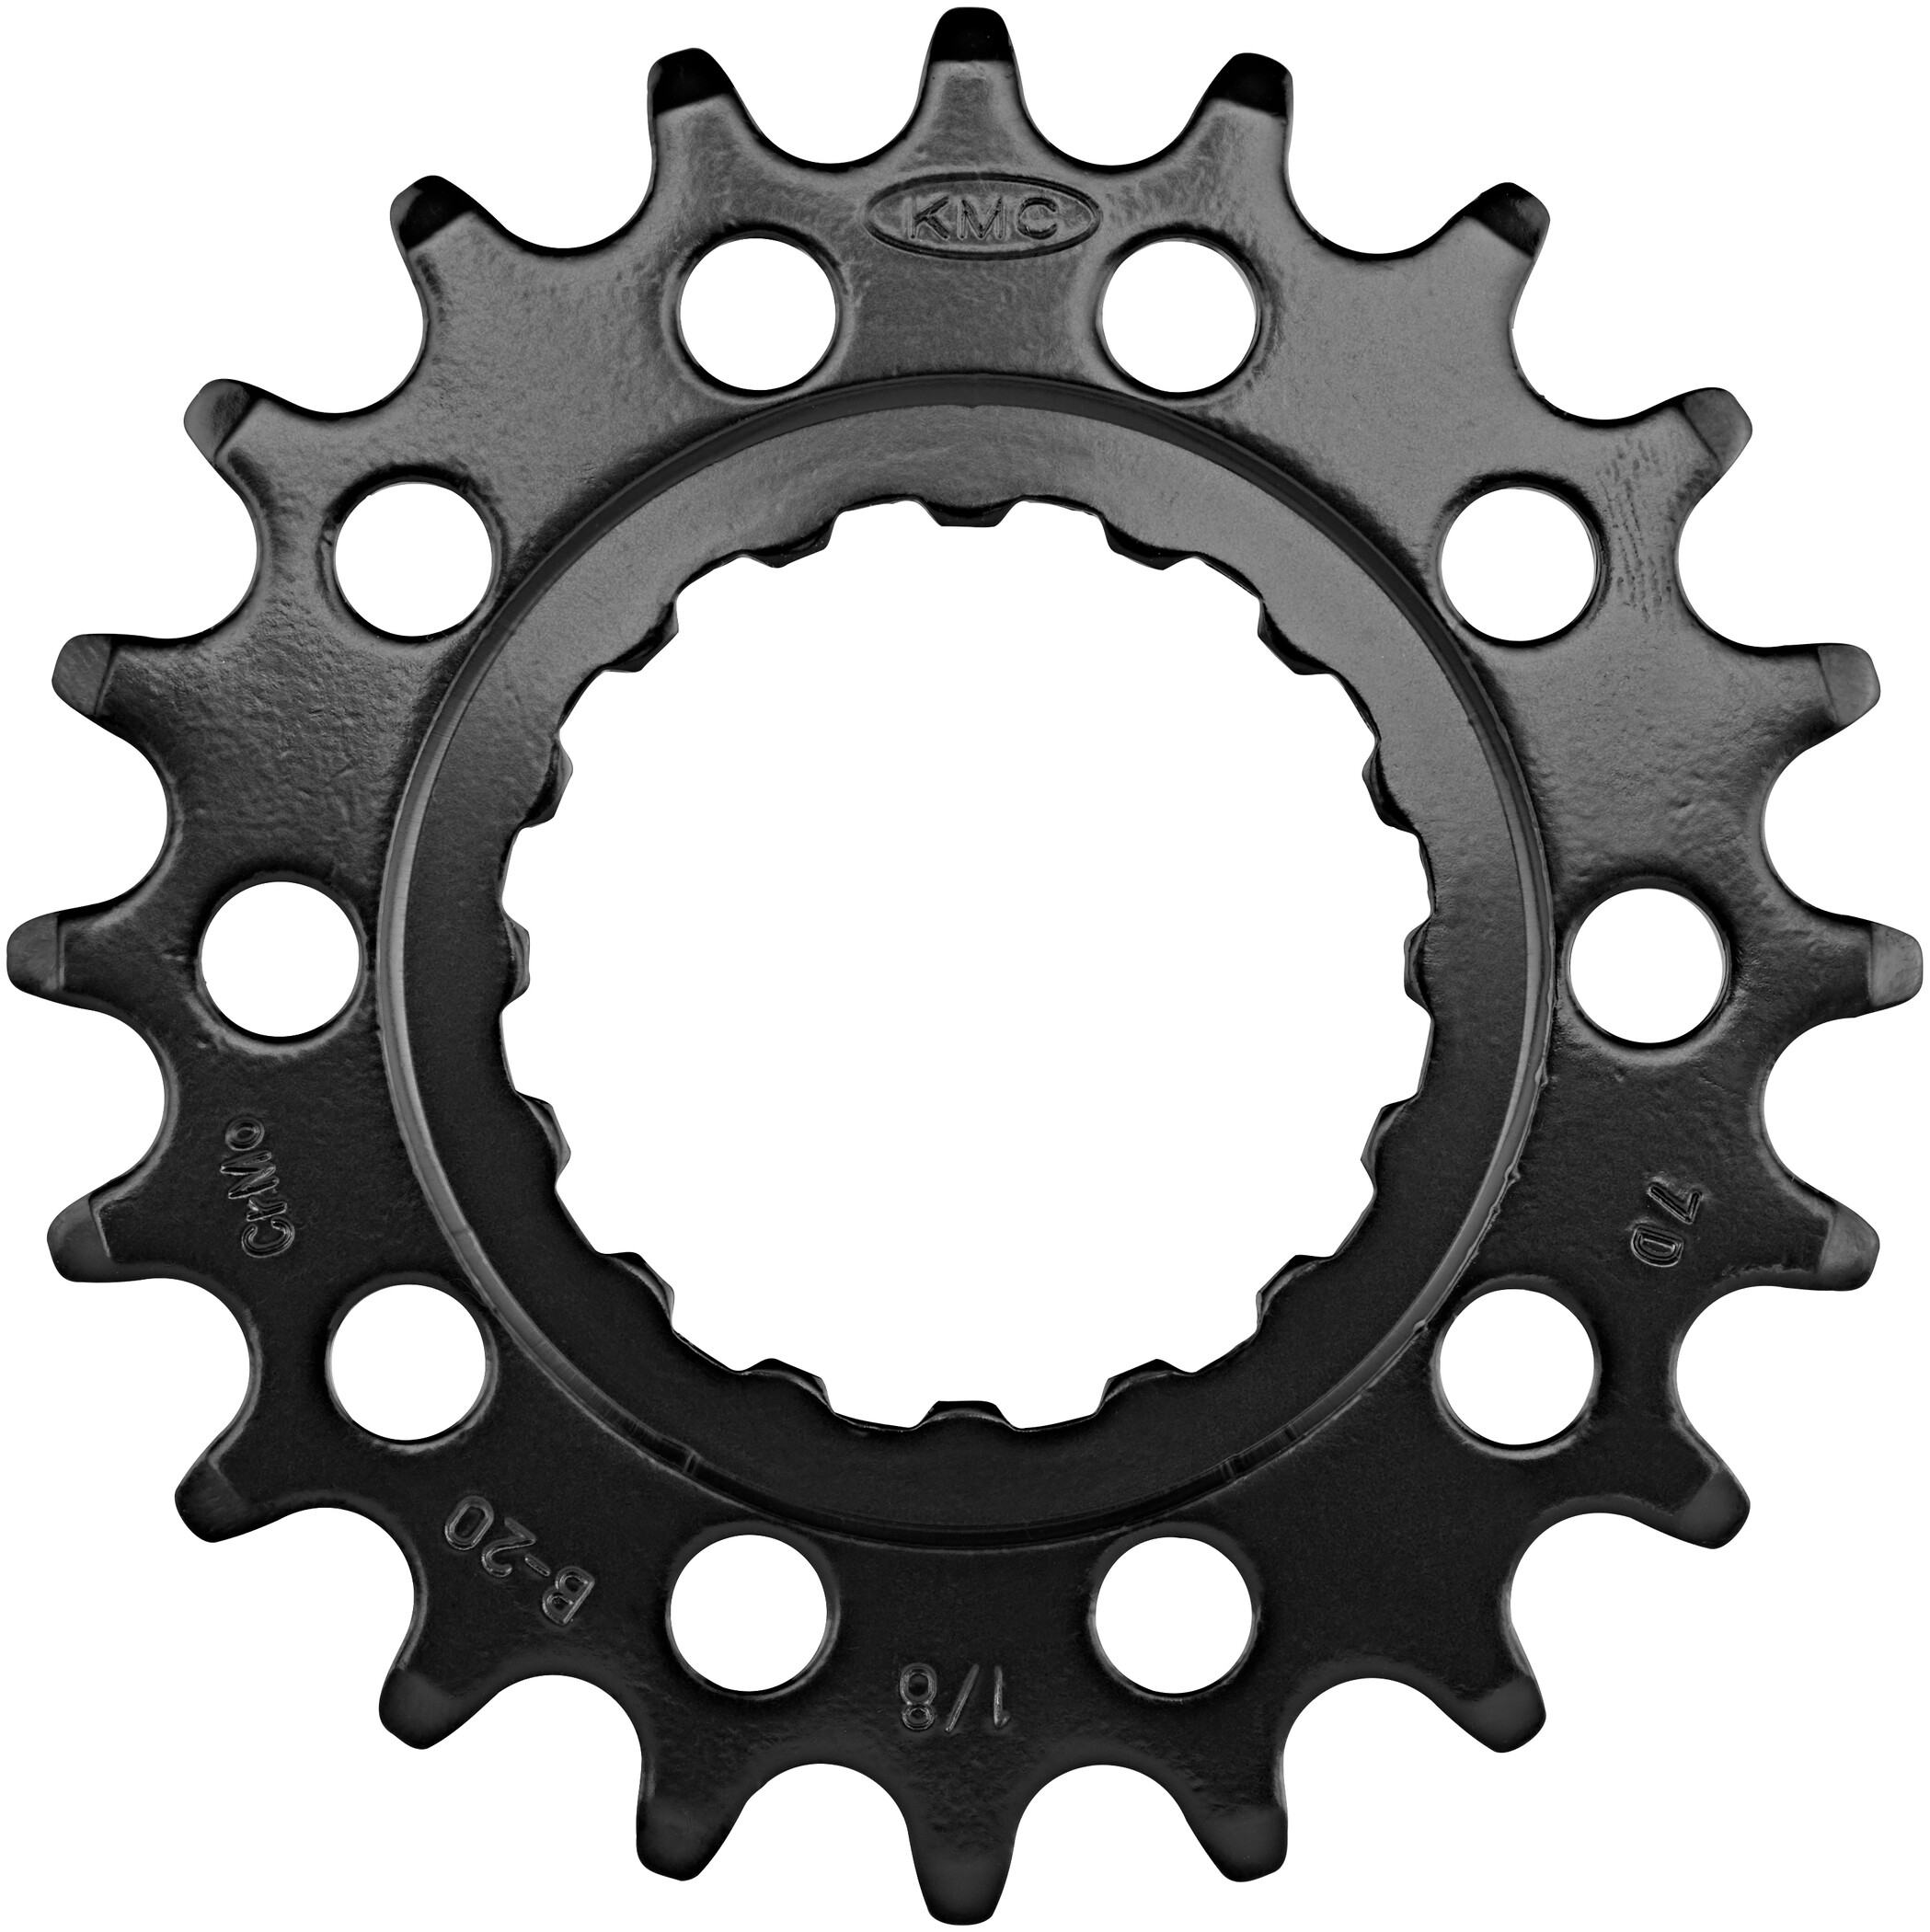 KMC Fahrrad Kassetten, Zahnkränze & Ritzel günstig kaufen | eBay